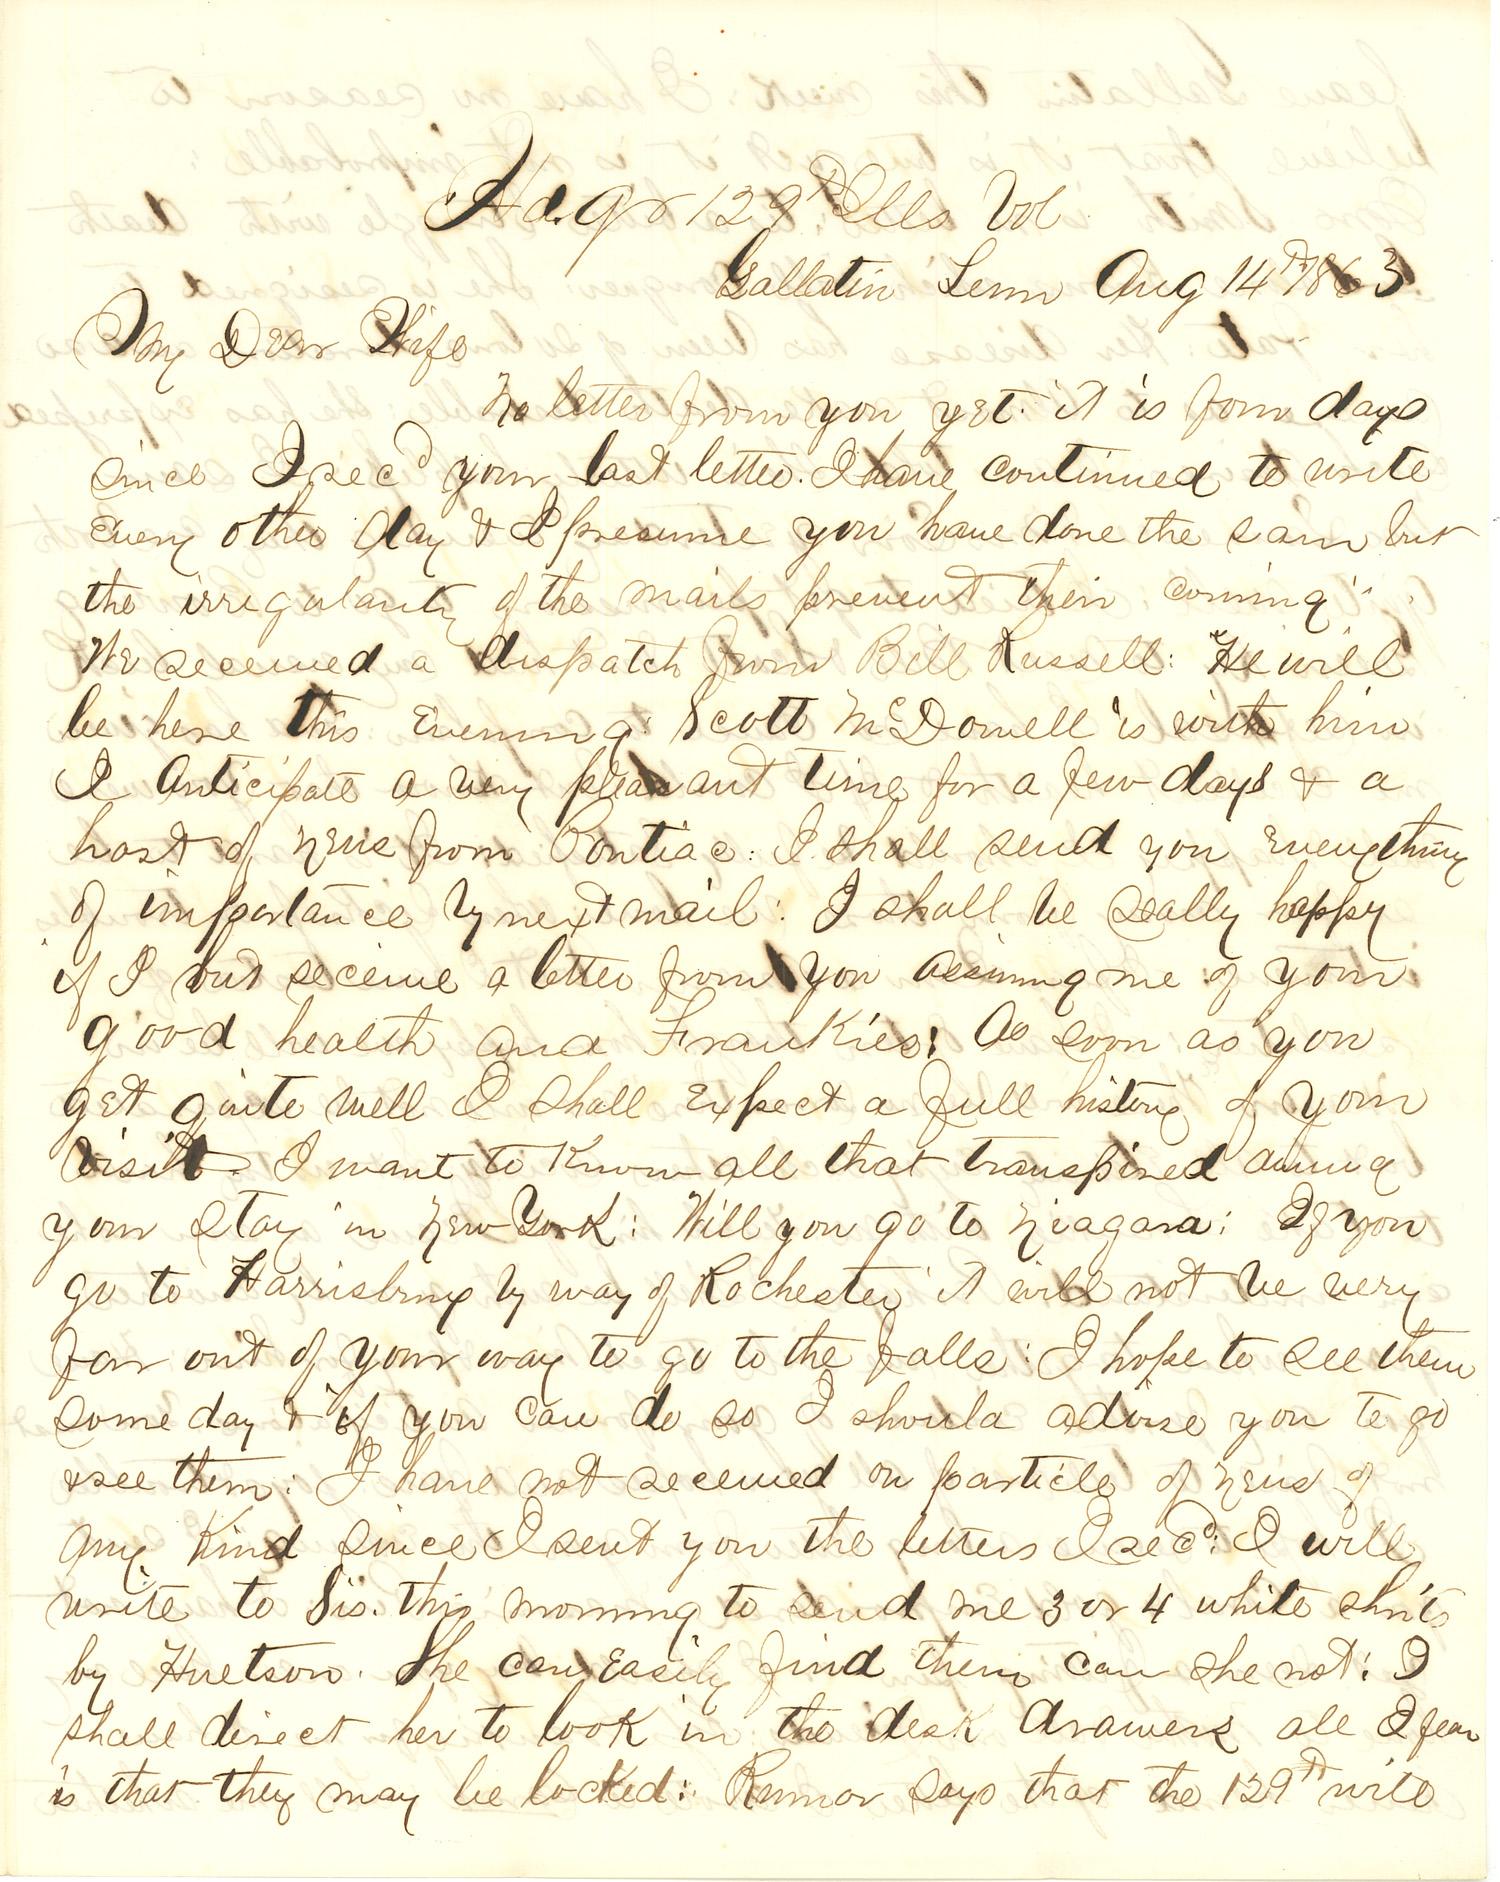 Joseph Culver Letter, August 14, 1863, Page 1